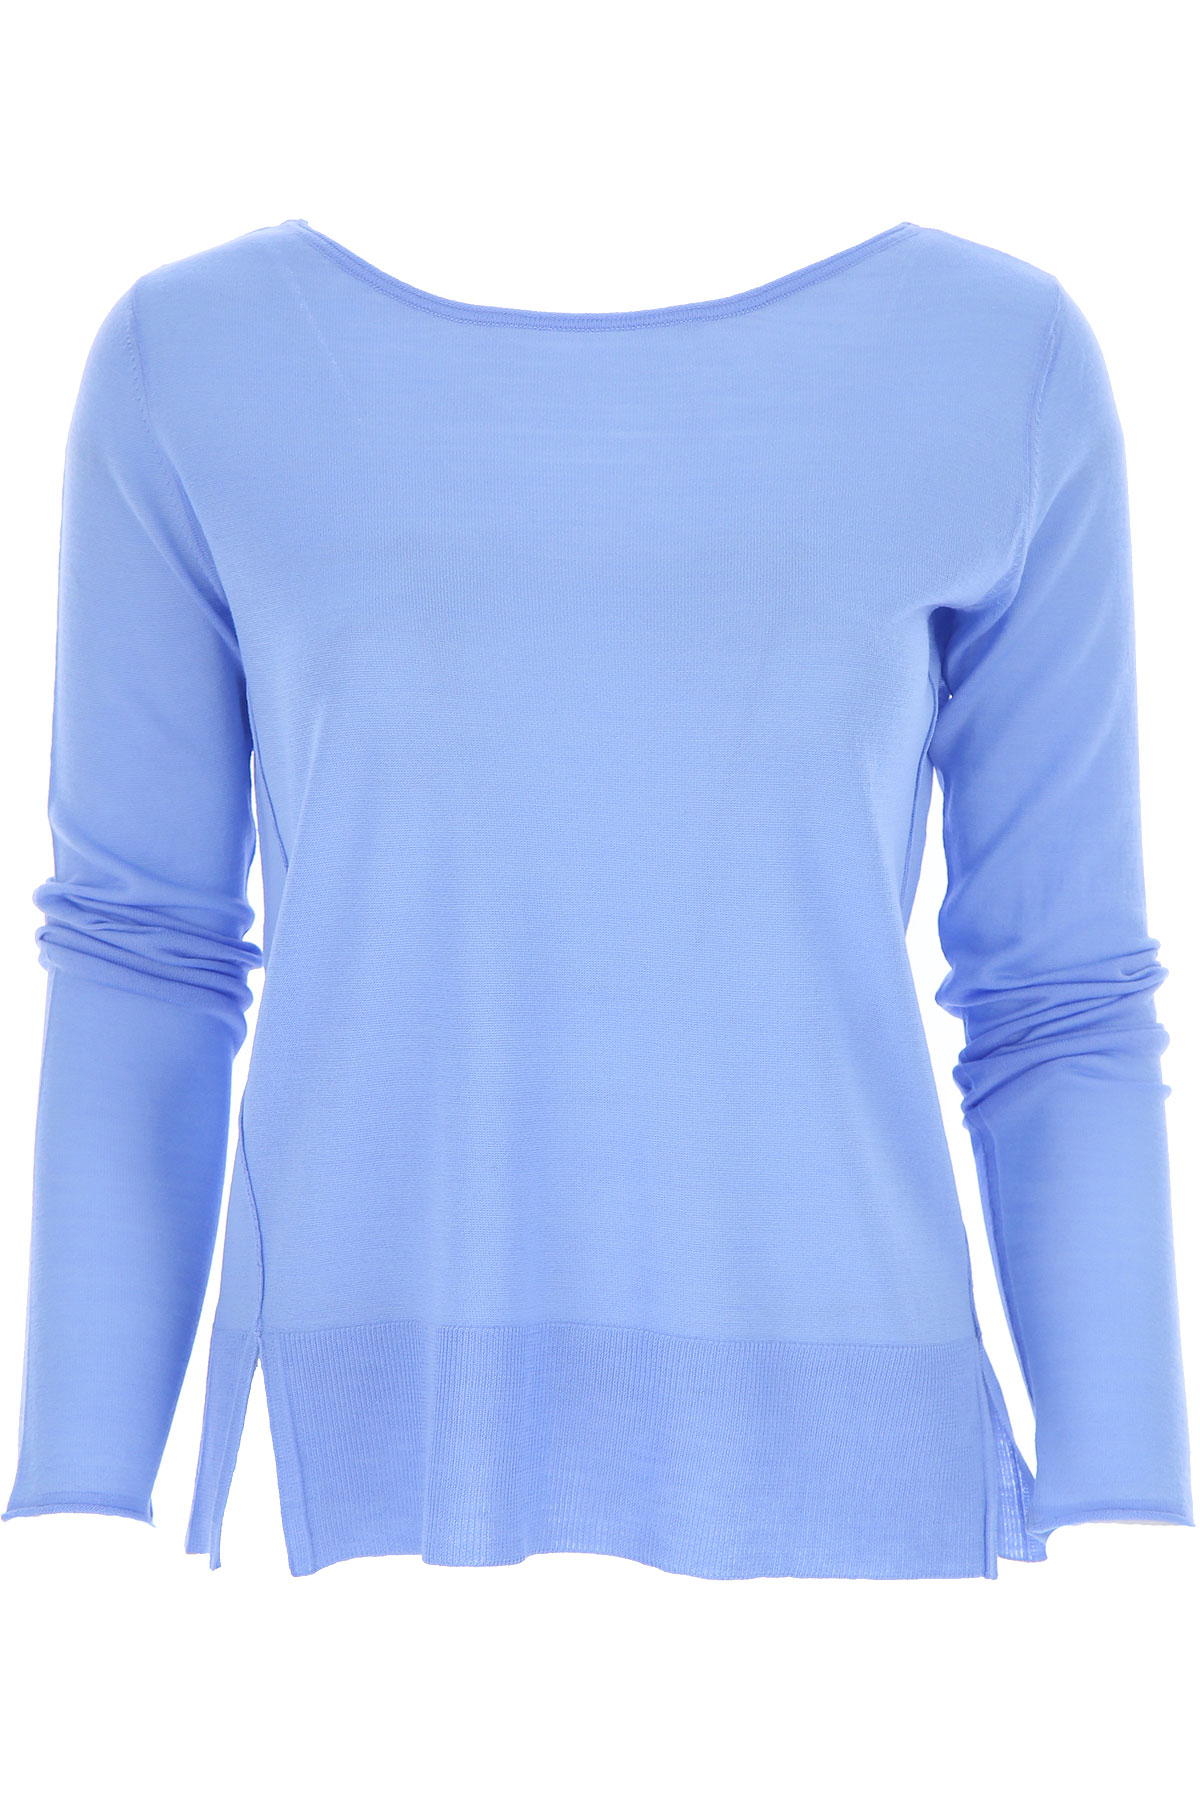 Roberto Collina Sweater for Women Jumper On Sale, pervinca, Merinos Wool, 2019, 4 8 XS